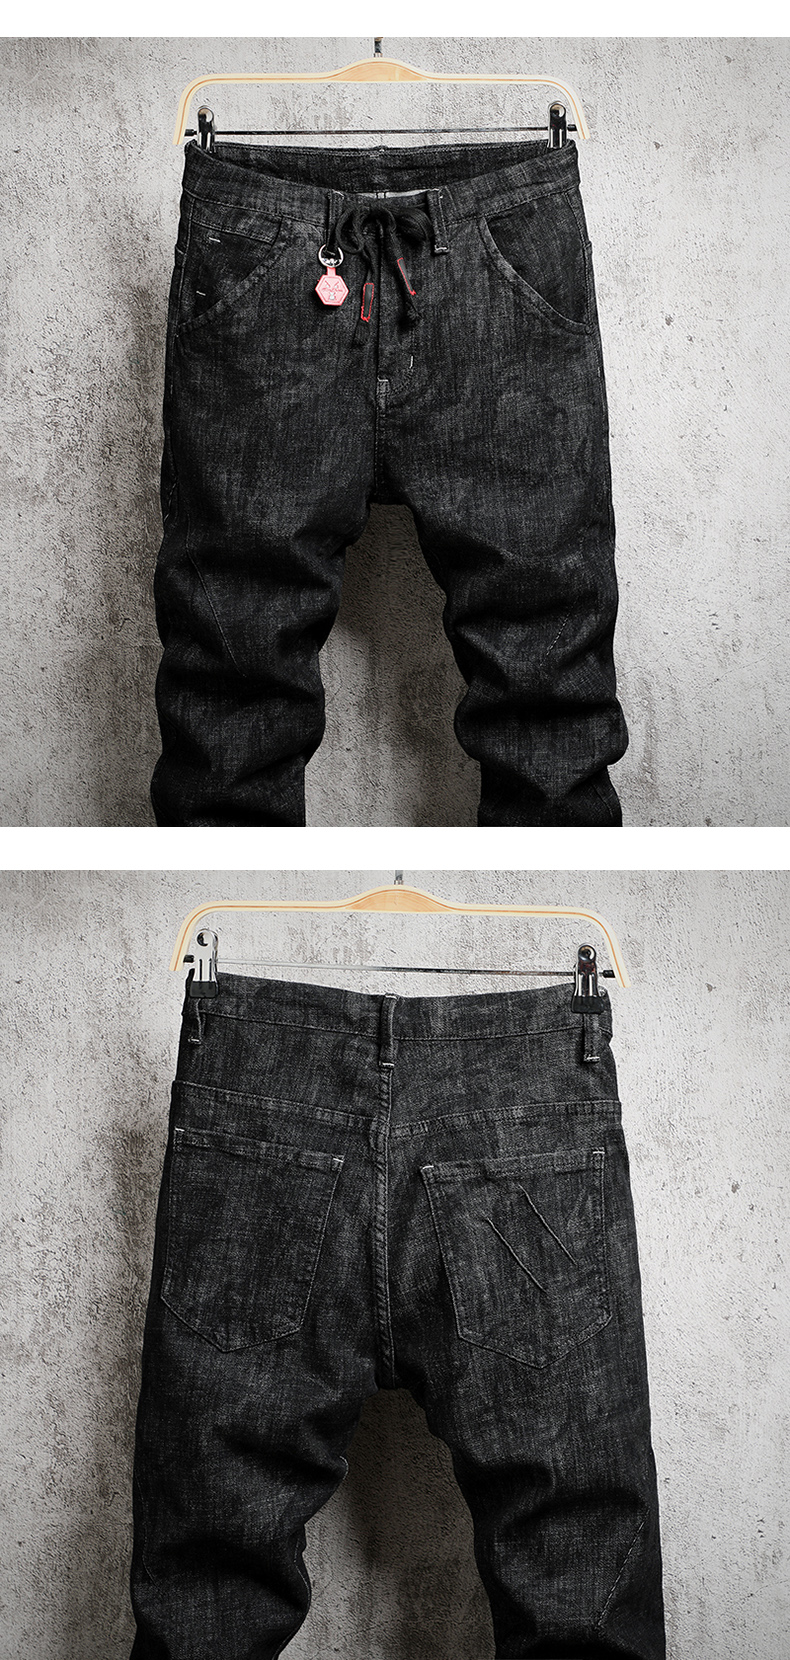 KSTUN jeans men autumn and winter black skinny slim hip hop denim pants drawstring elastic waist